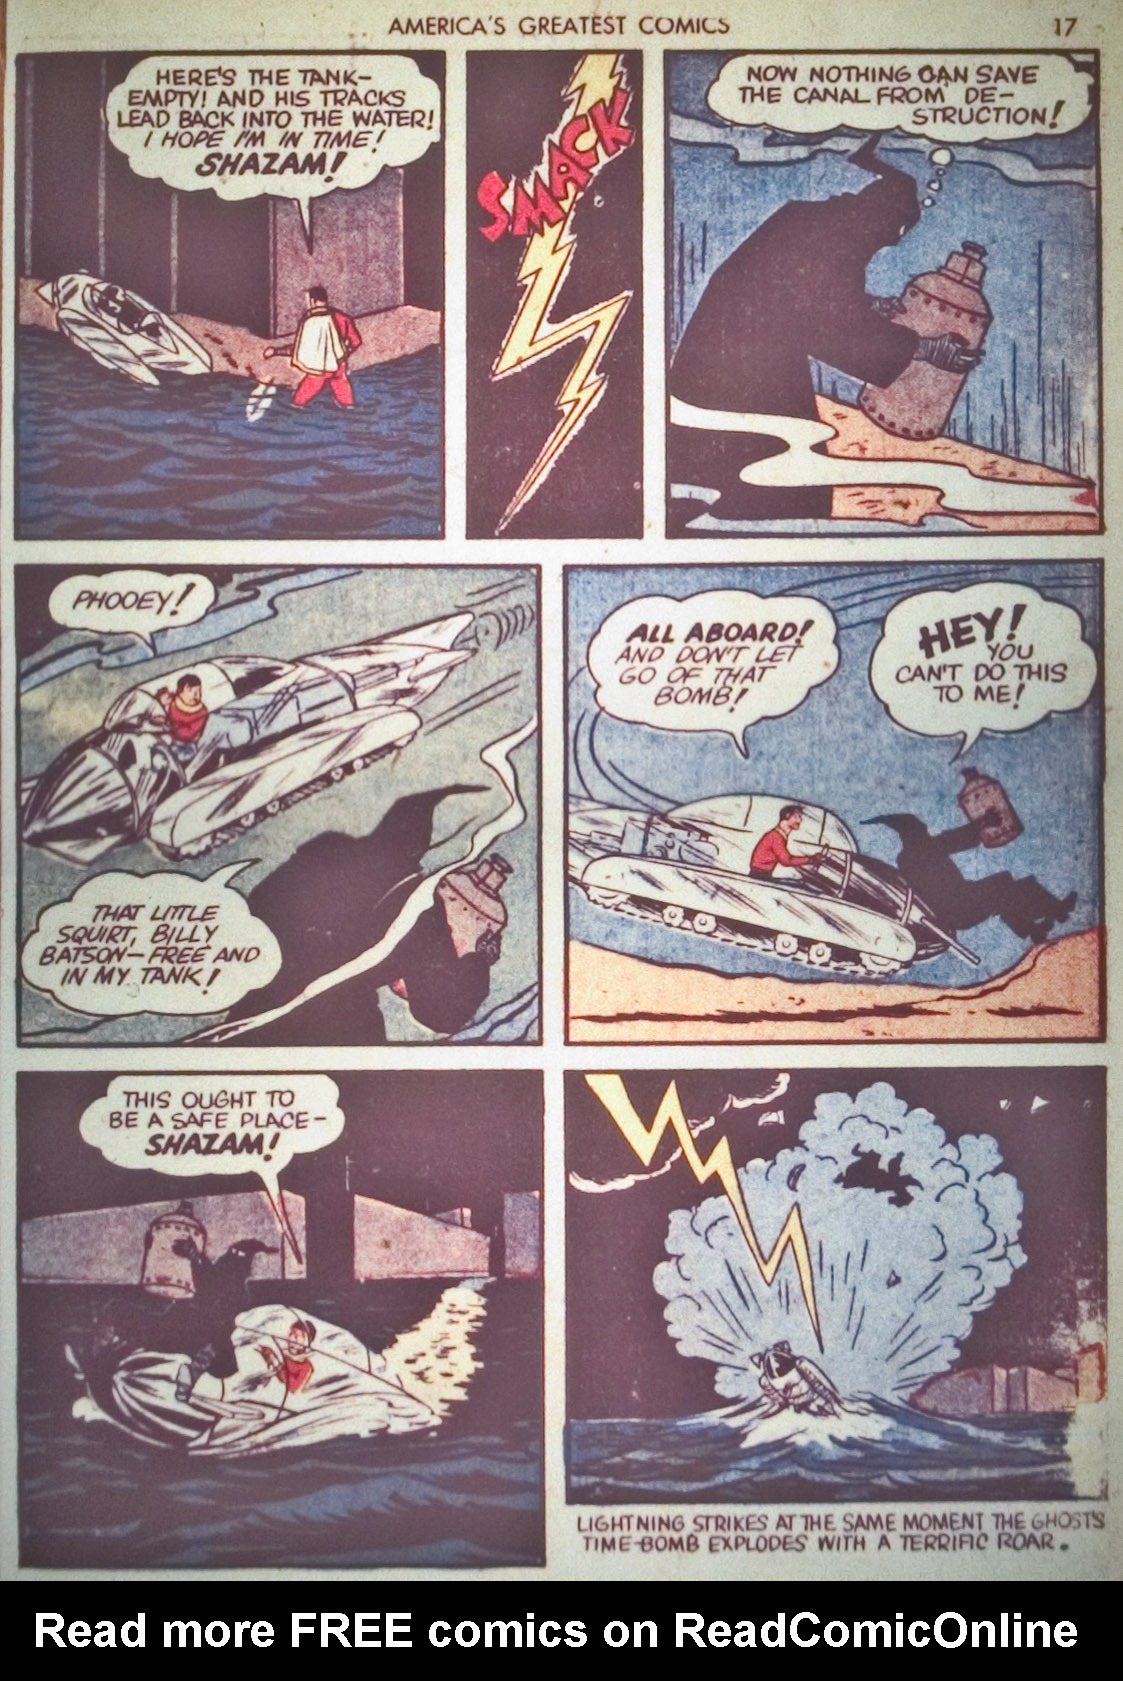 Read online America's Greatest Comics comic -  Issue #1 - 20